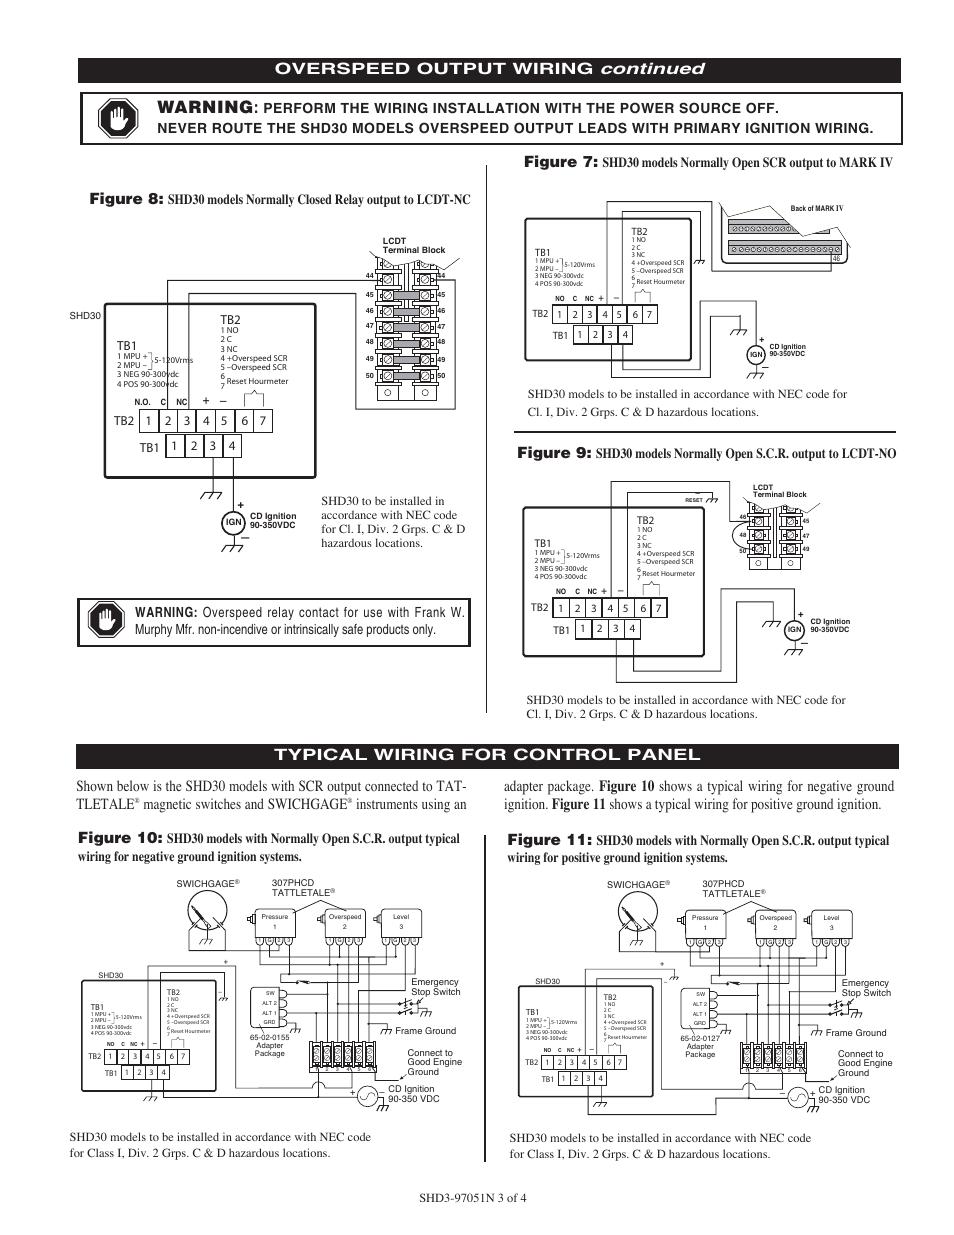 digital tach wiring taotao ata 50 wiring diagram